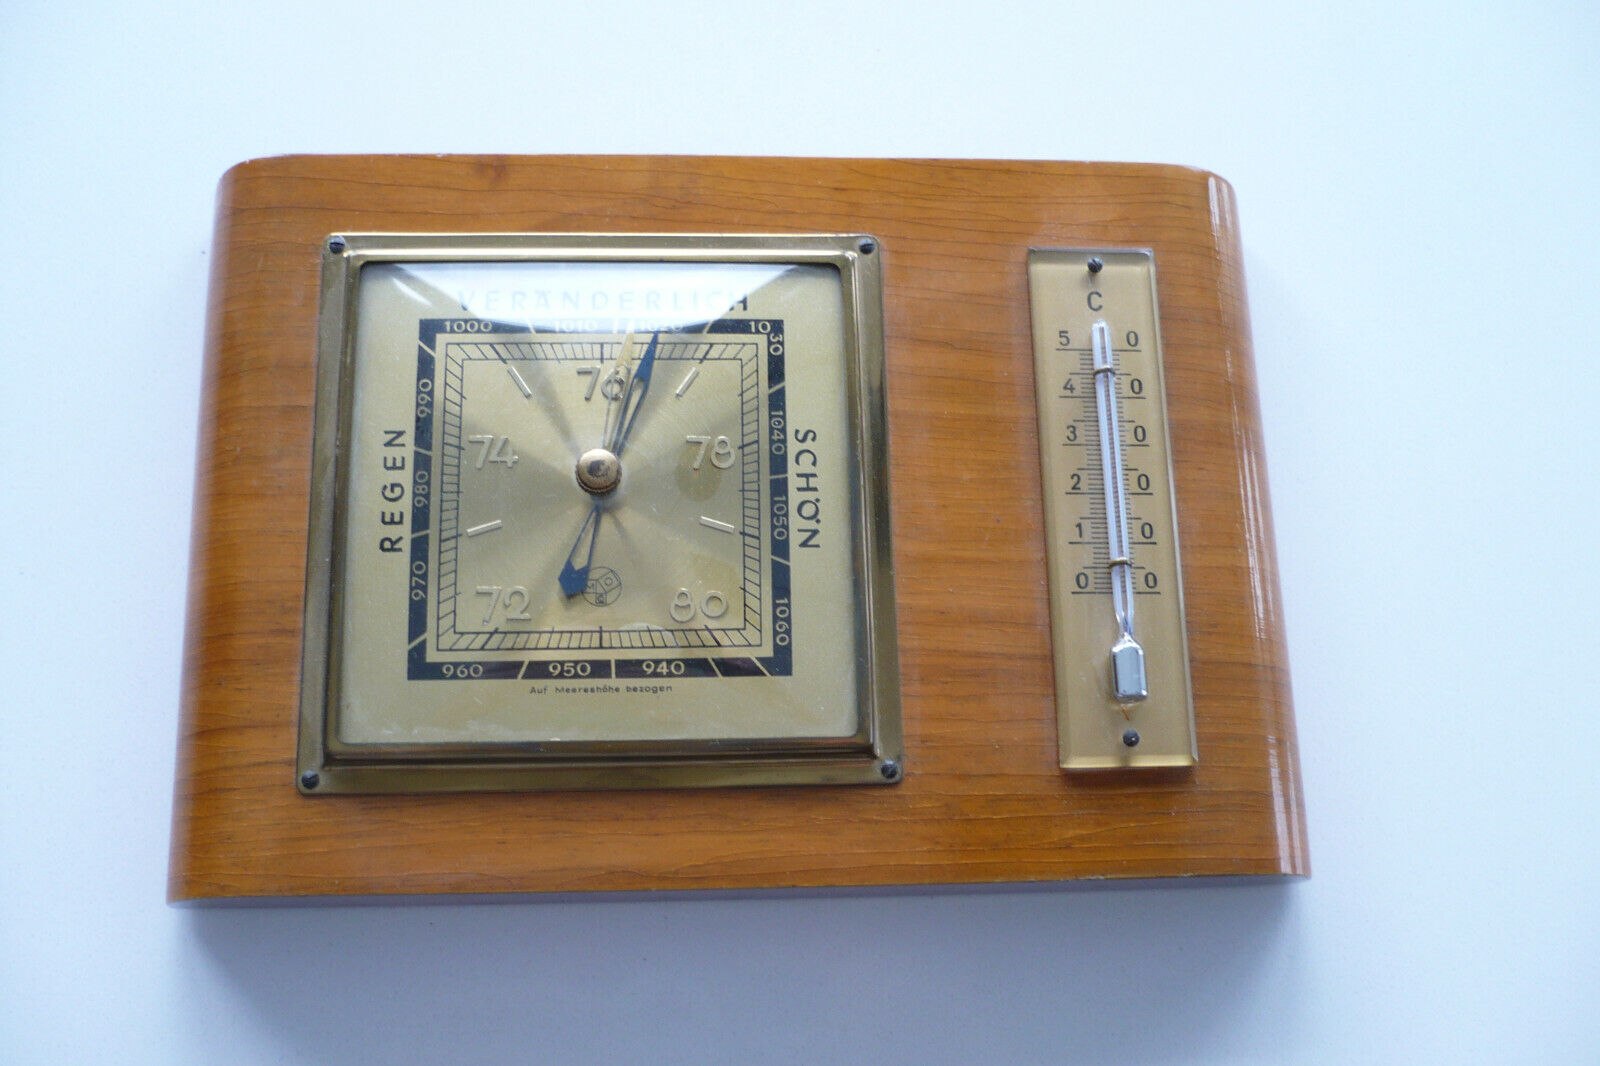 altes Barometer, Wetterstation, Thermometer, Holz, Messing, Glas